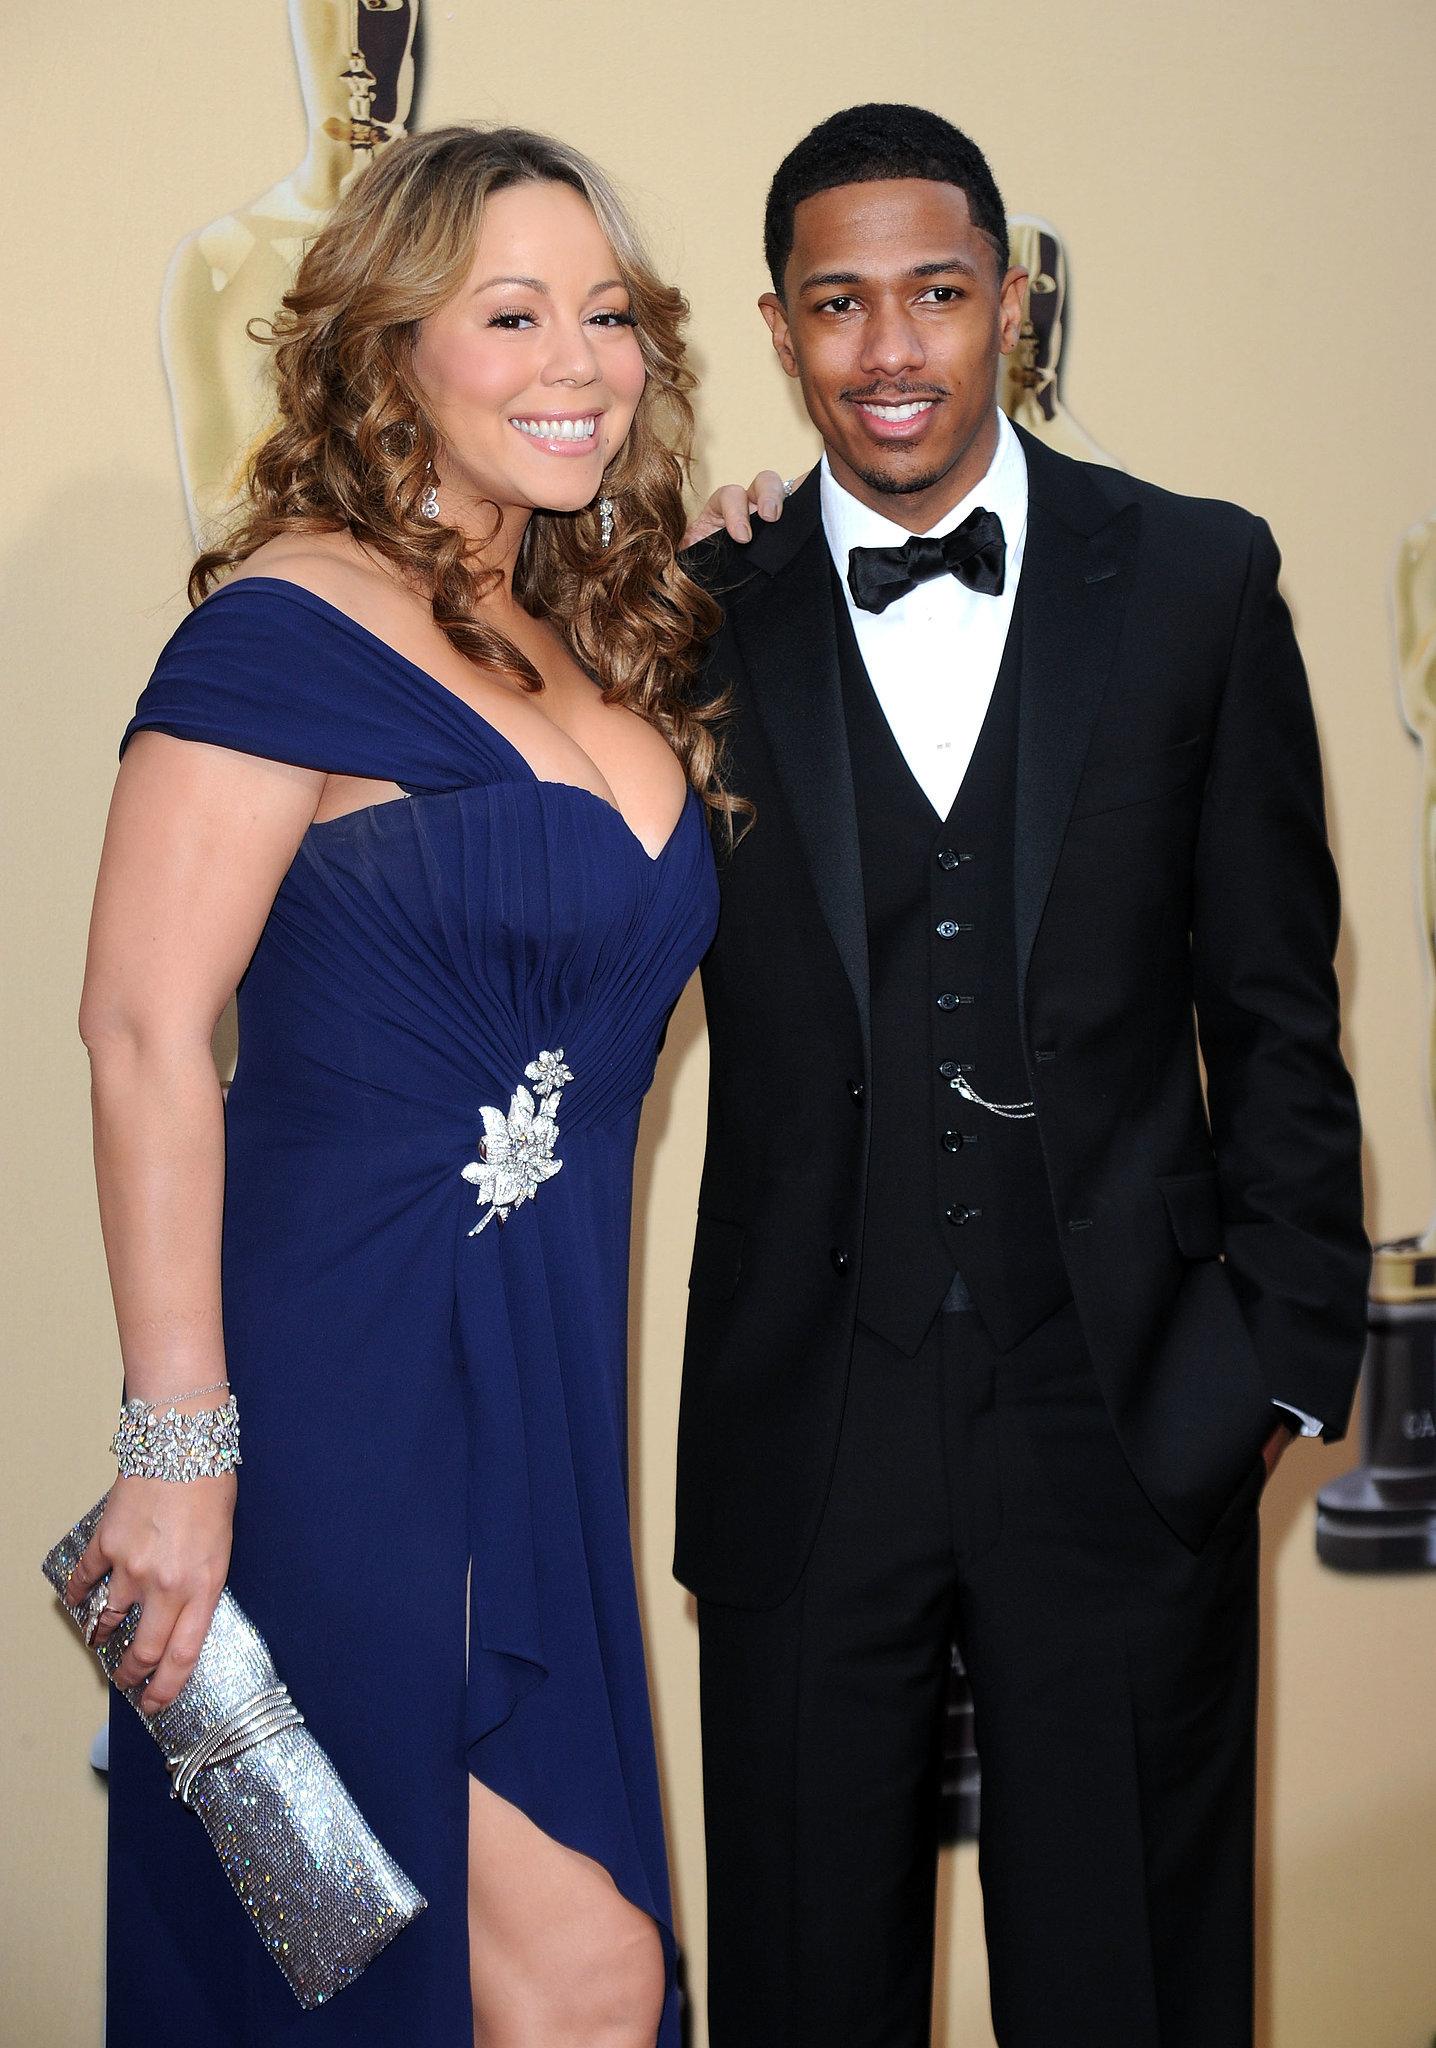 Mariah Carey and Nick Cannon | POPSUGAR Celebrity